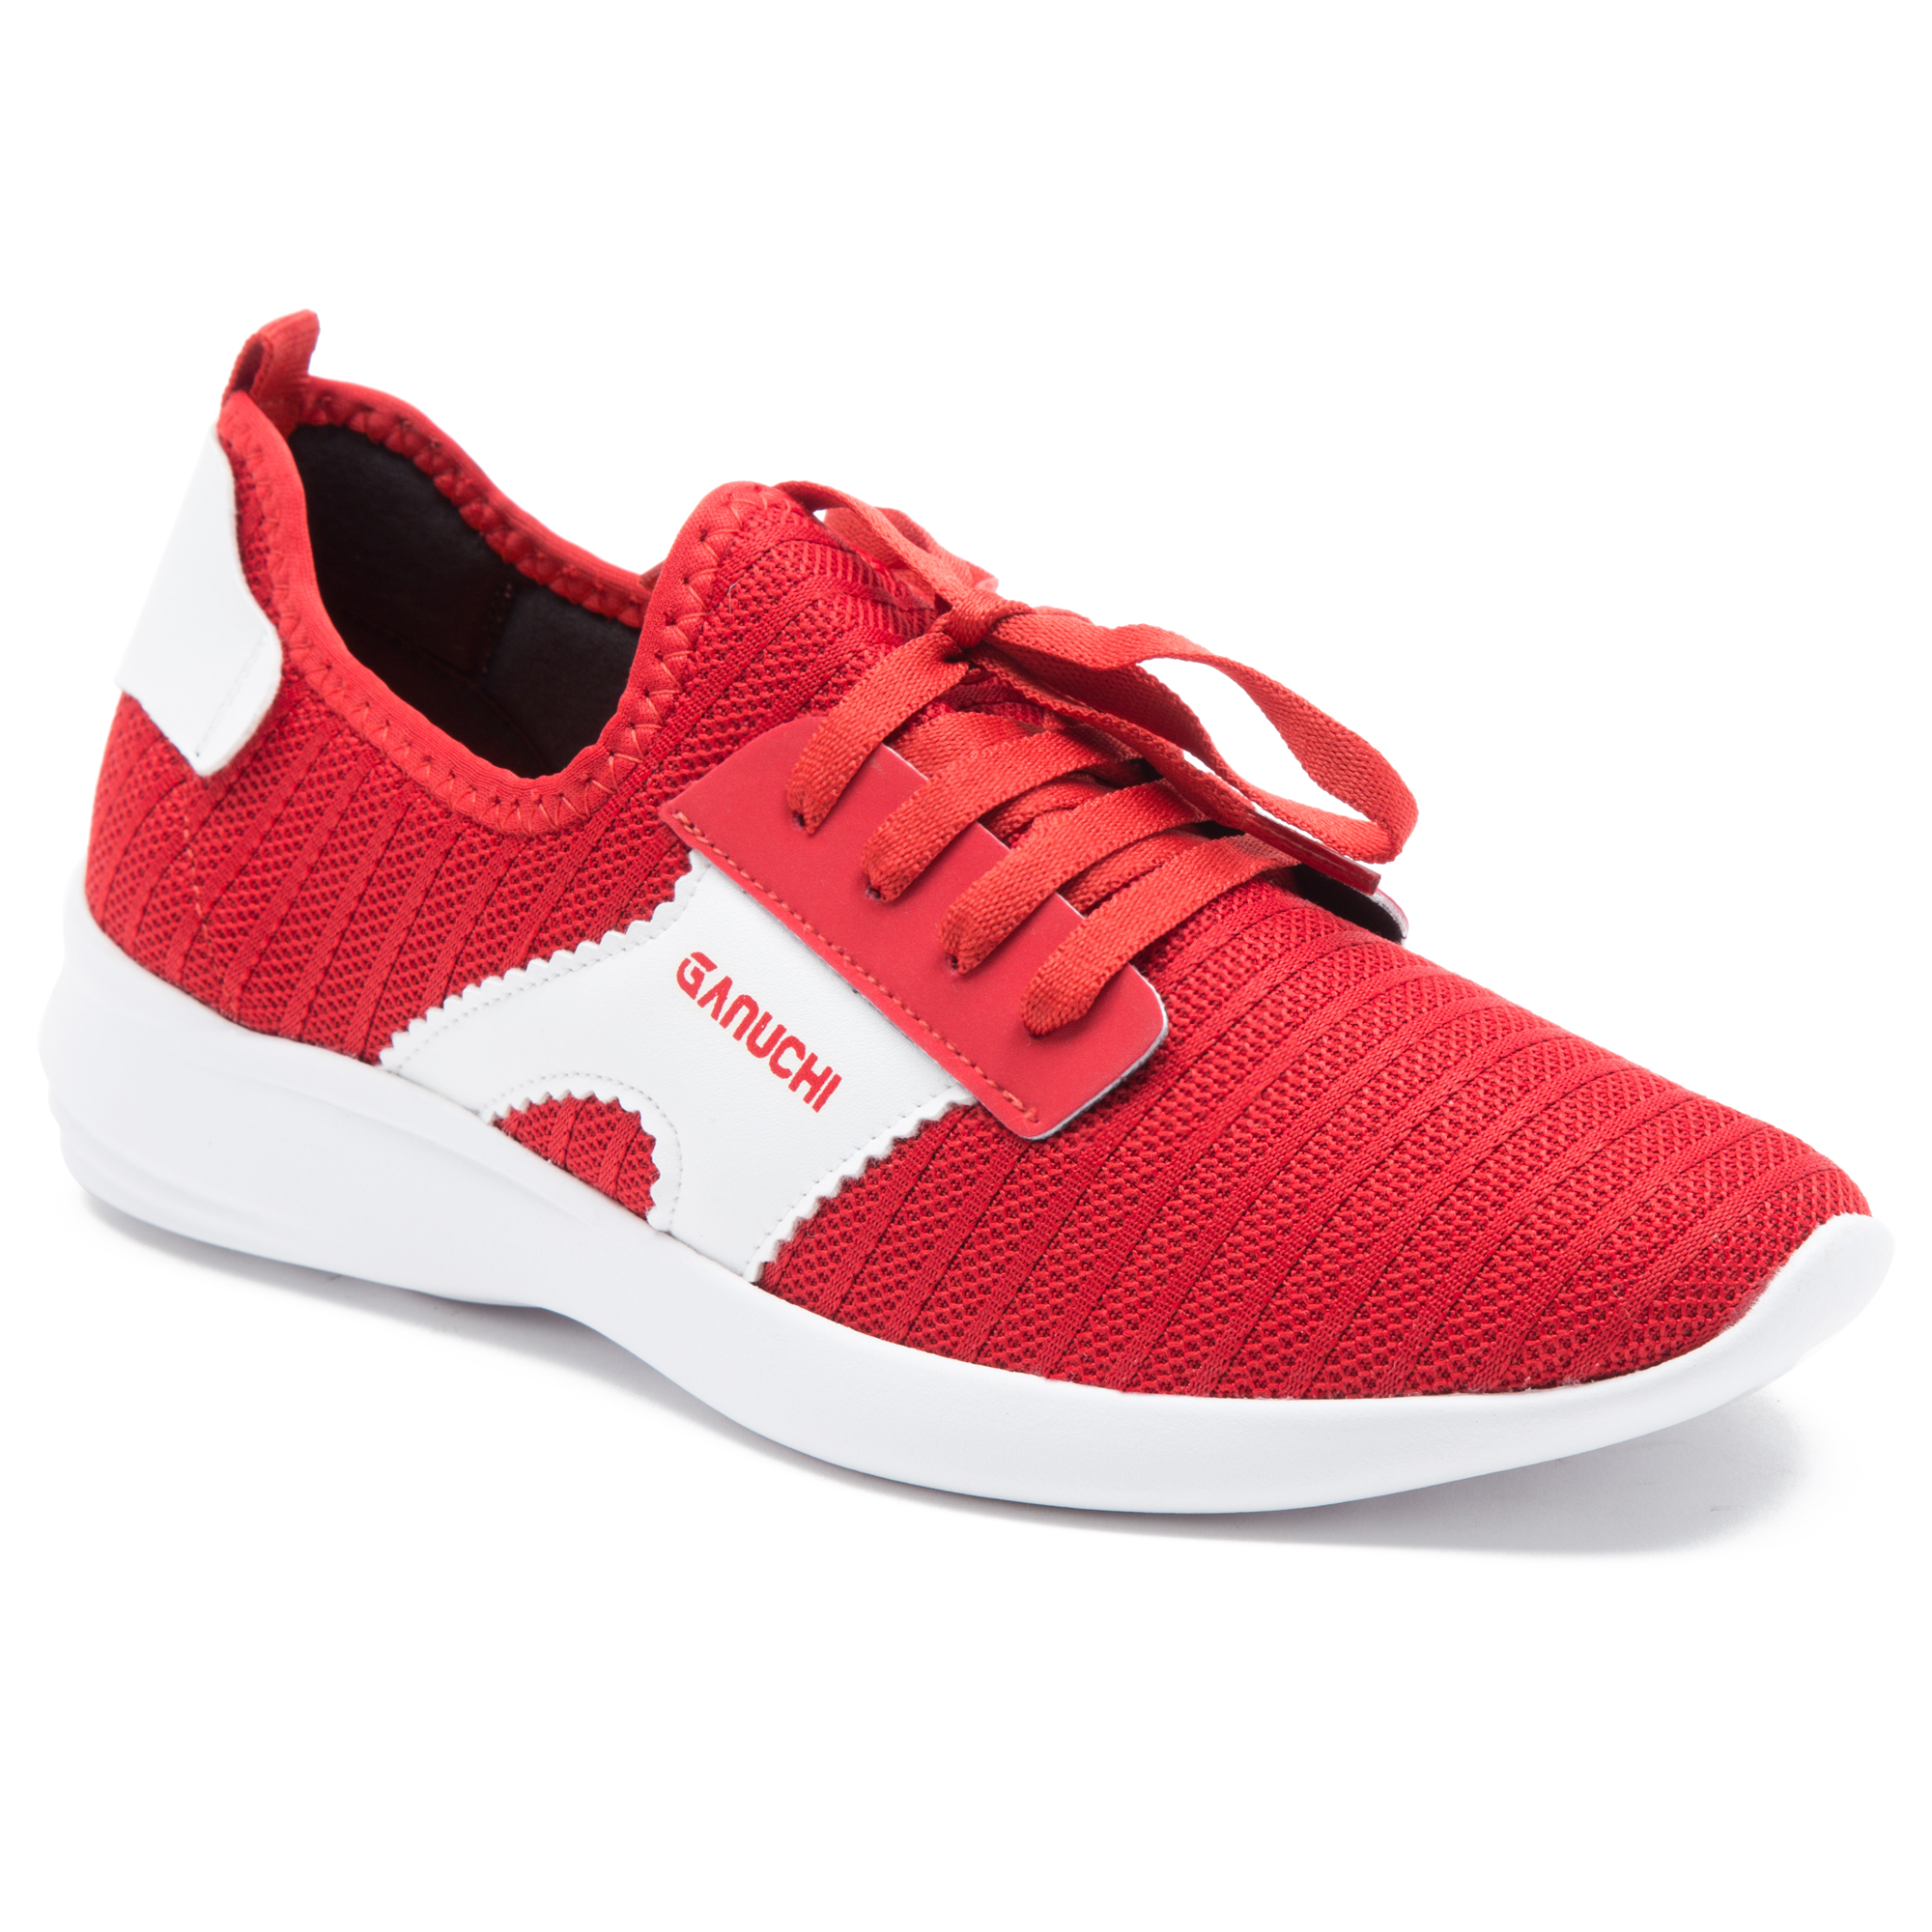 GANUCHI   Ganuchi by Franco Leone Women's Mesh Red Running Shoes